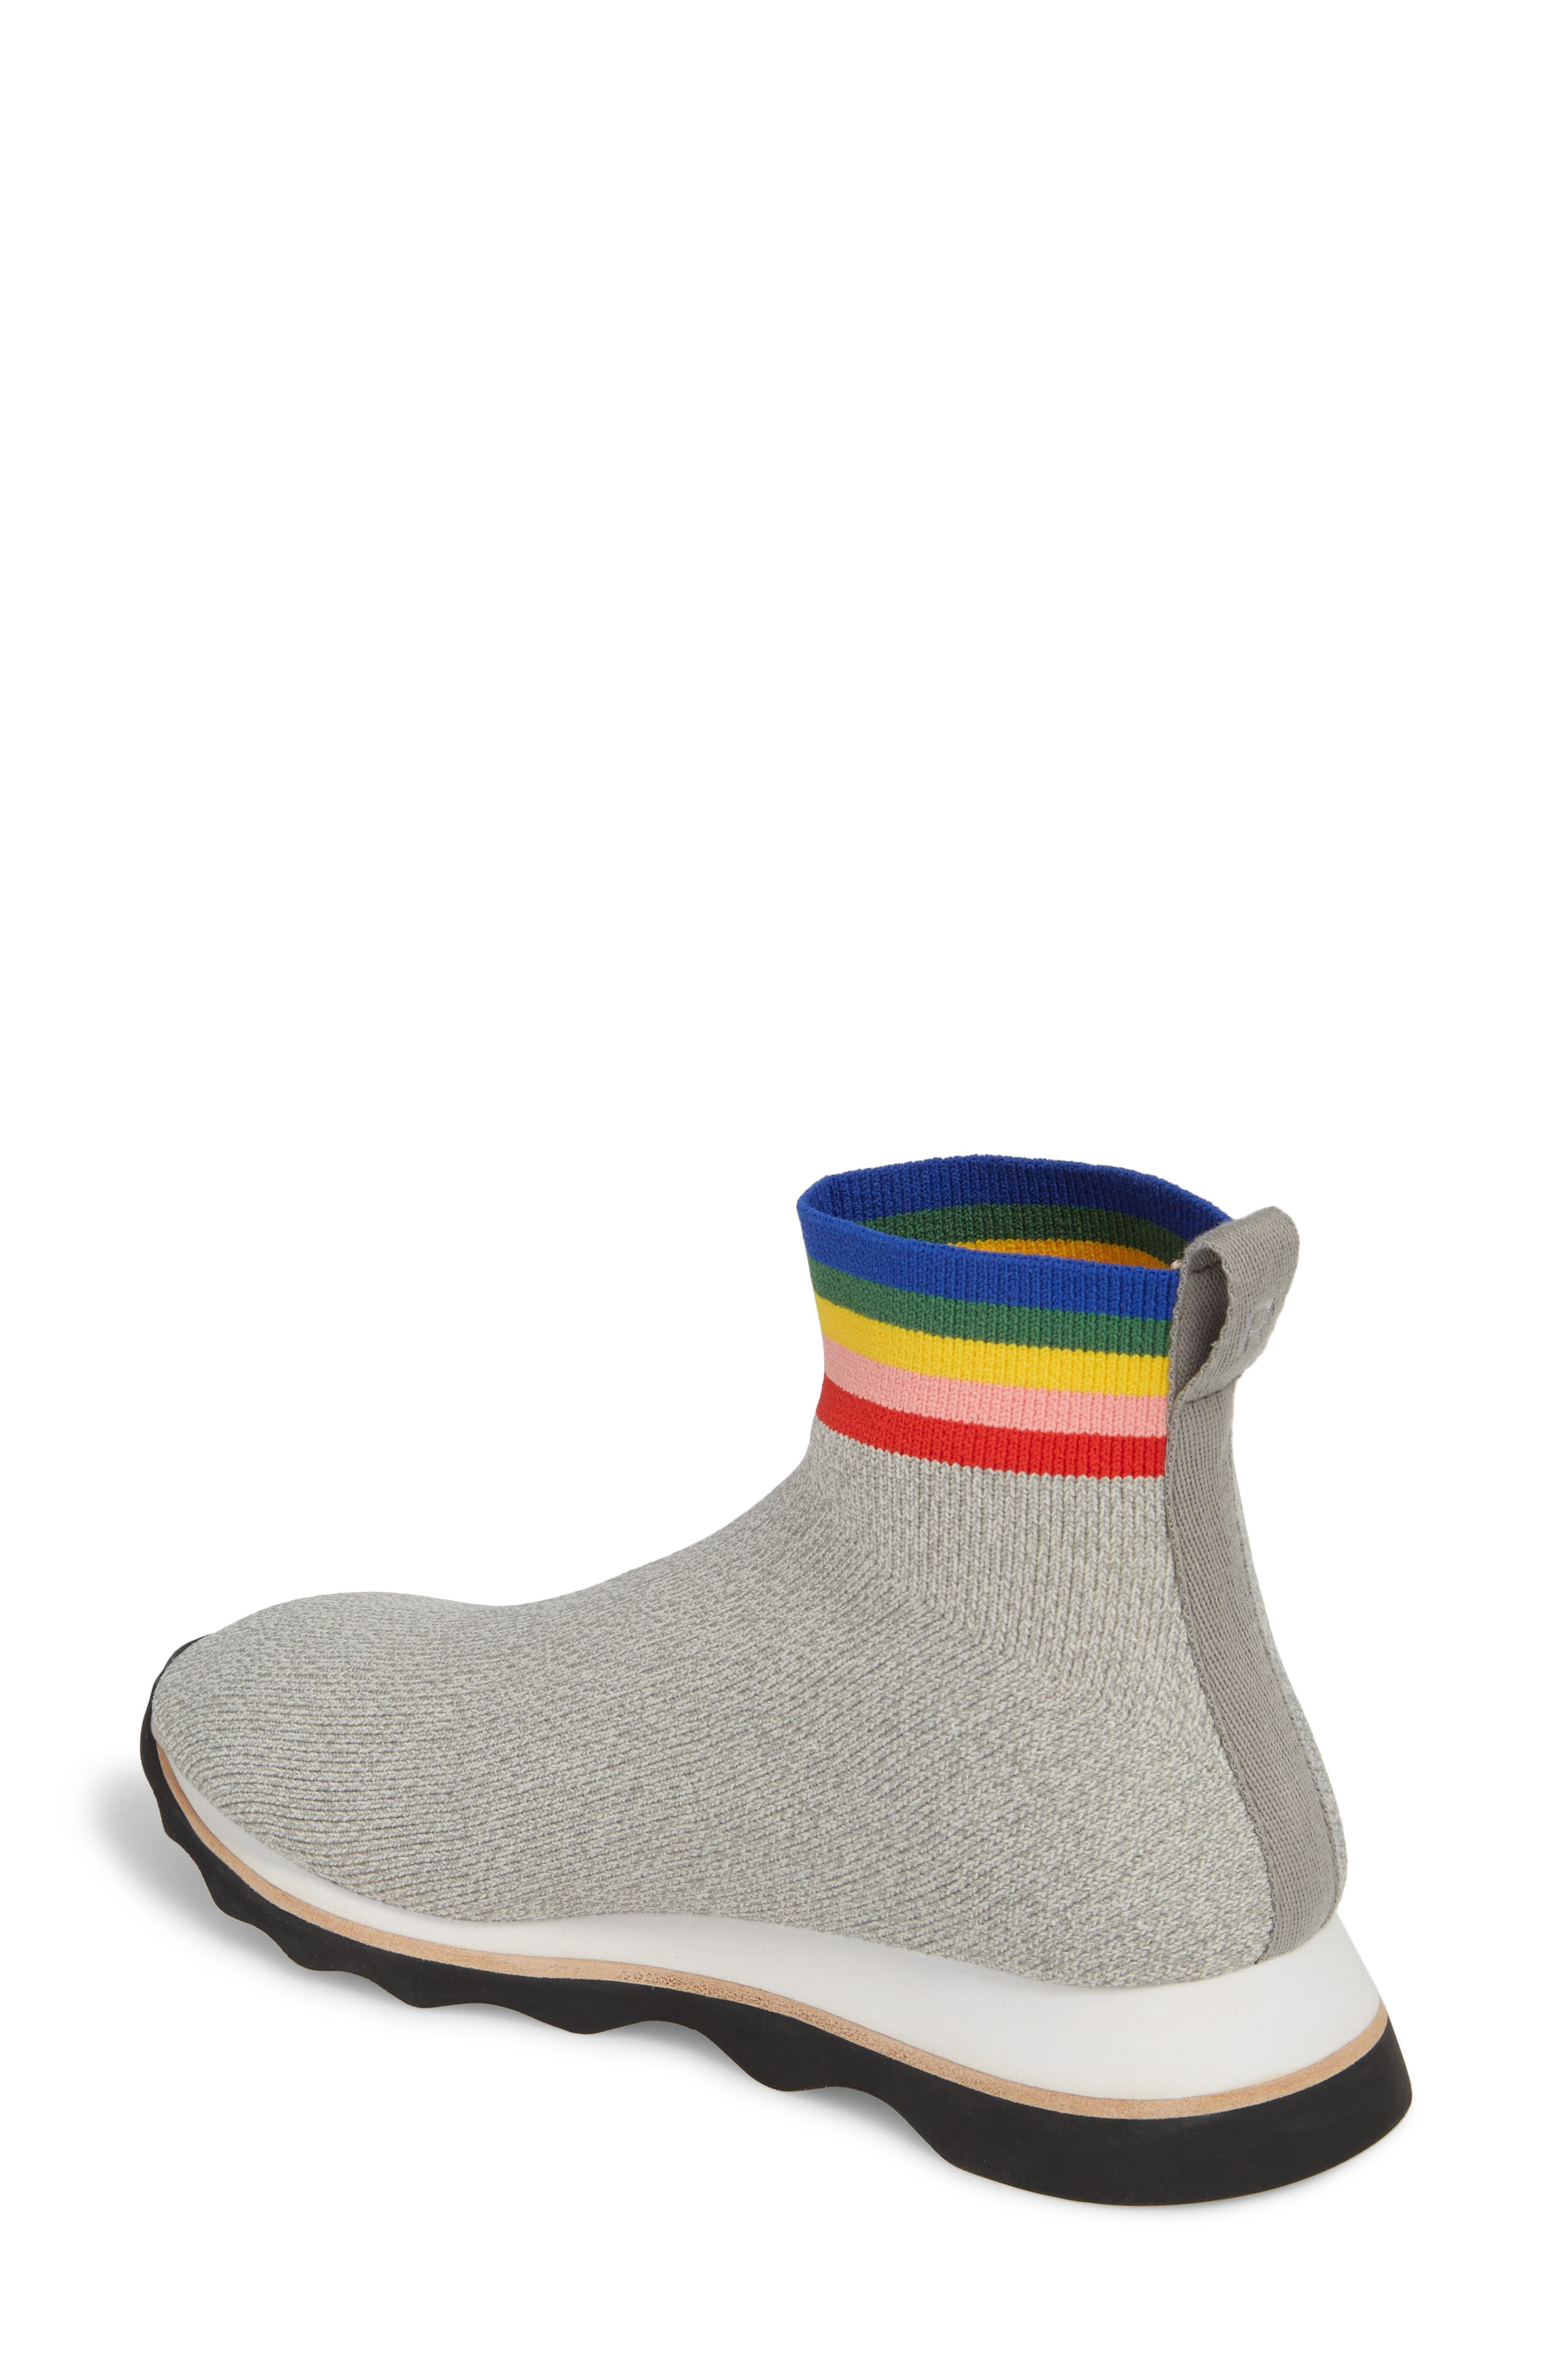 Scout Sock Sneaker,                             Alternate thumbnail 2, color,                             Grey/ Rainbow